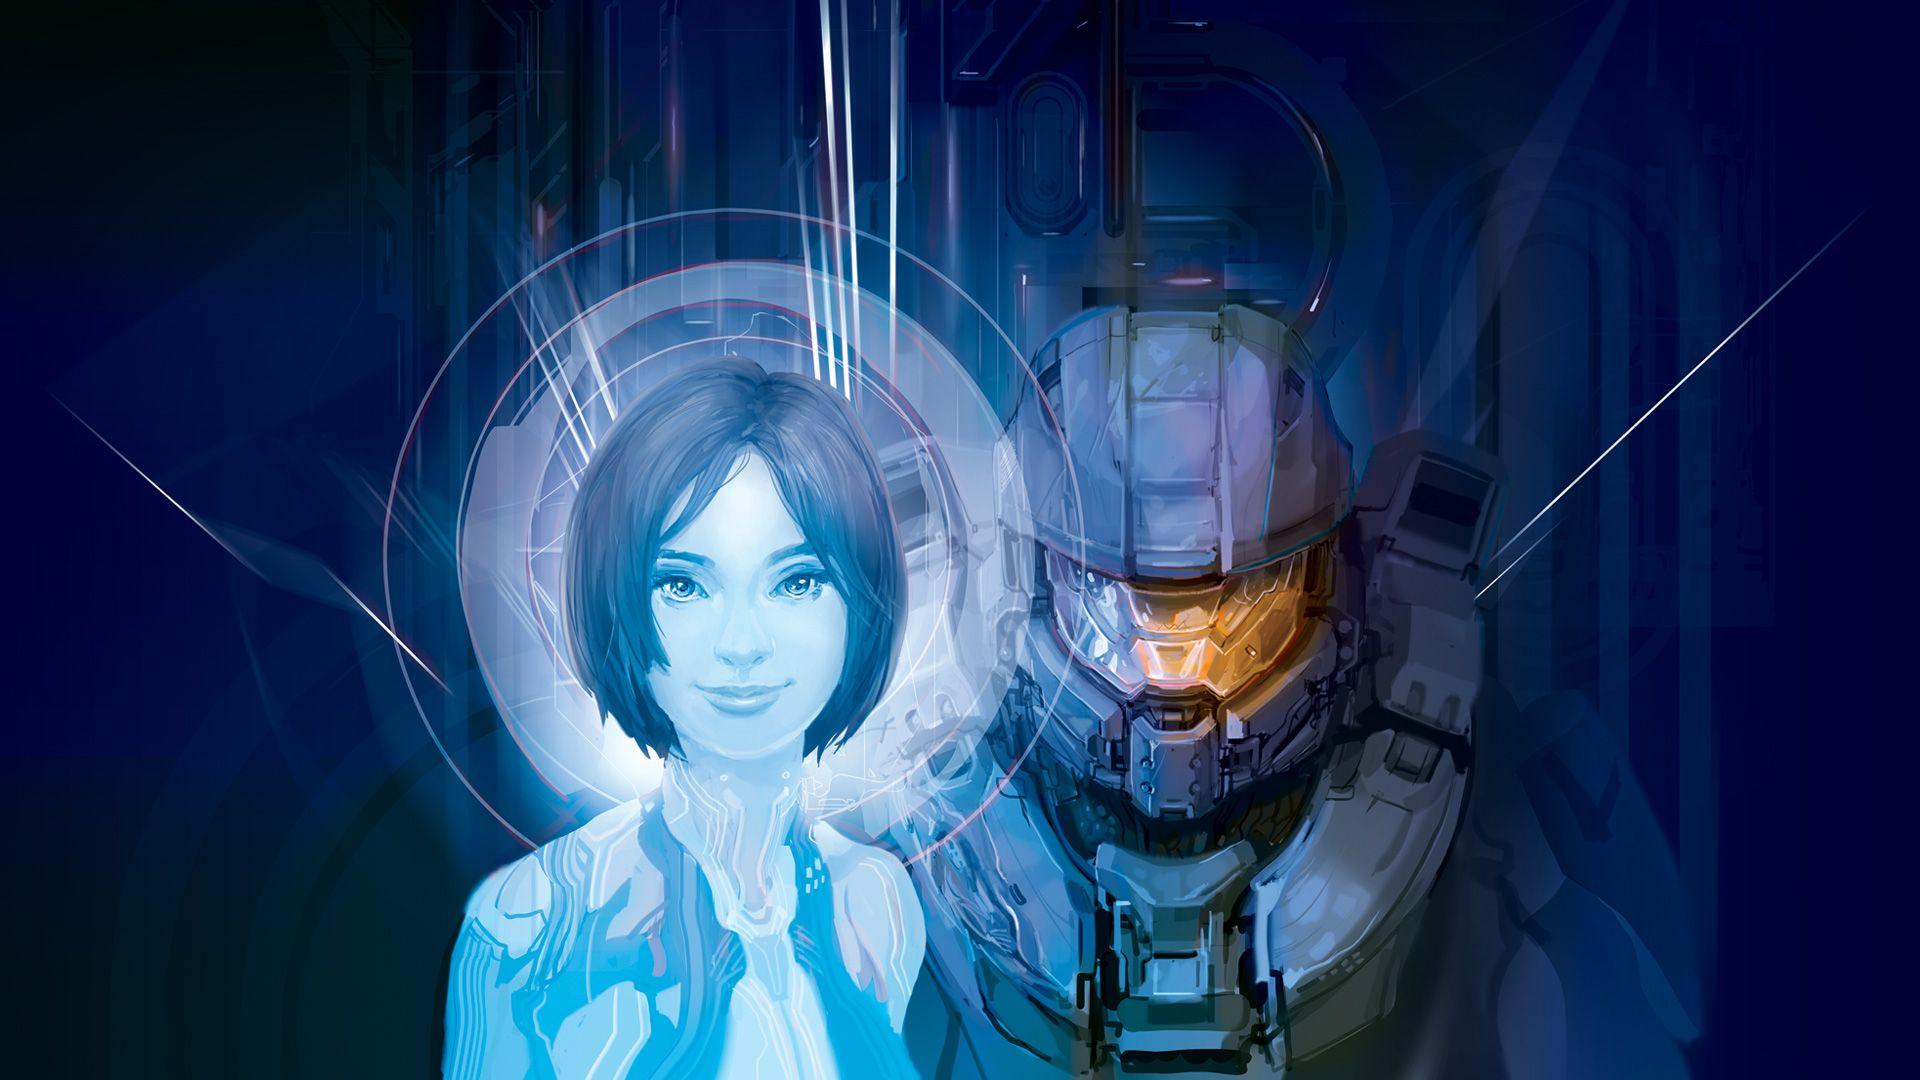 Como αμοιβή jugar συμπαίκτη εν πρόσβαση Halo